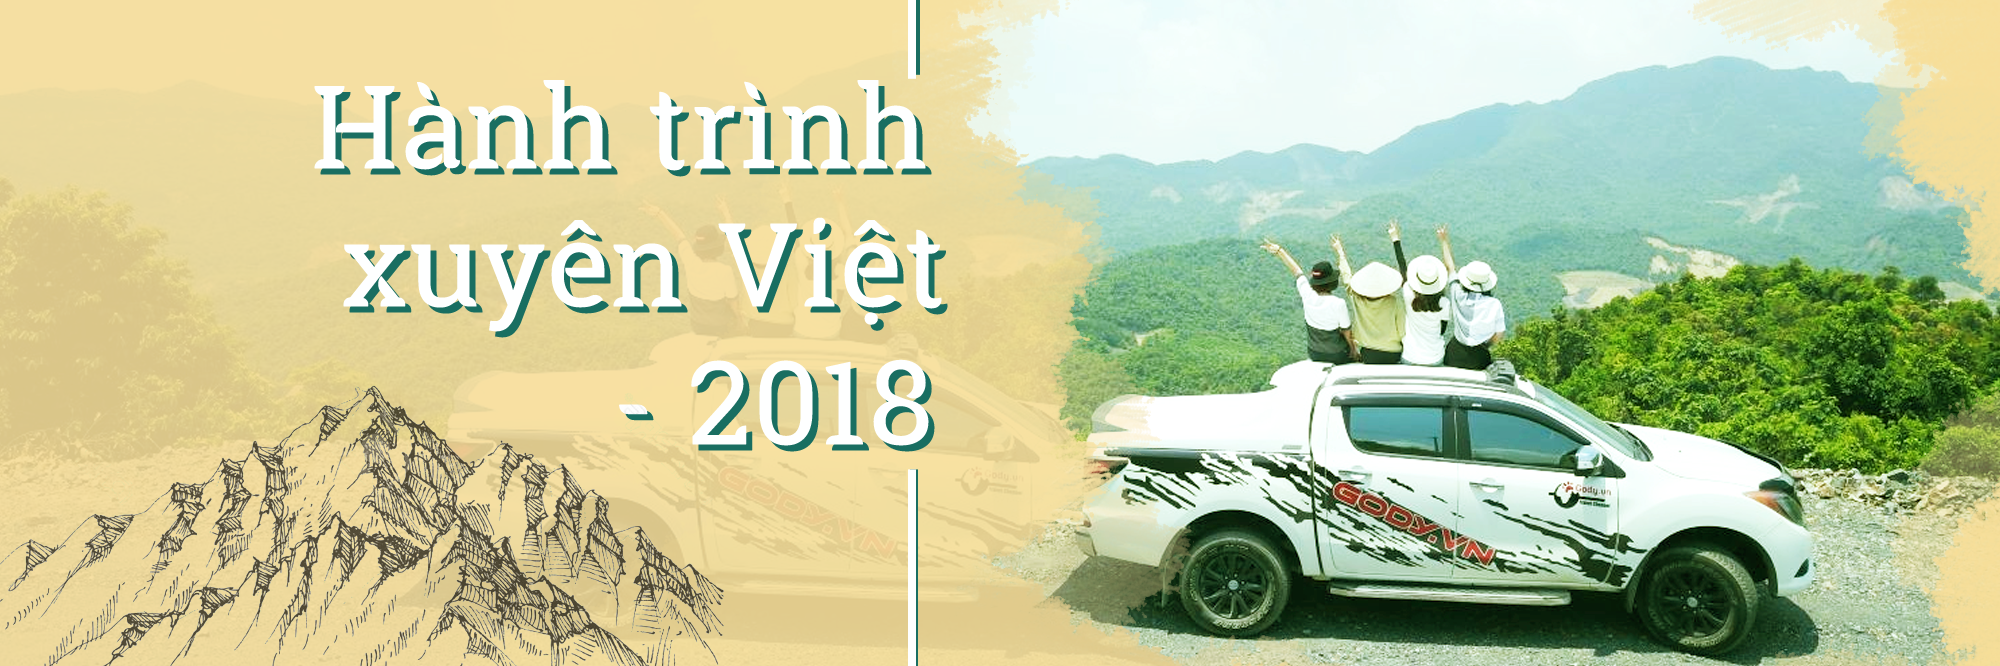 https://gody.vn/blog/gody1.vn6365/post/gody-hanh-trinh-xuyen-viet-2018-3291